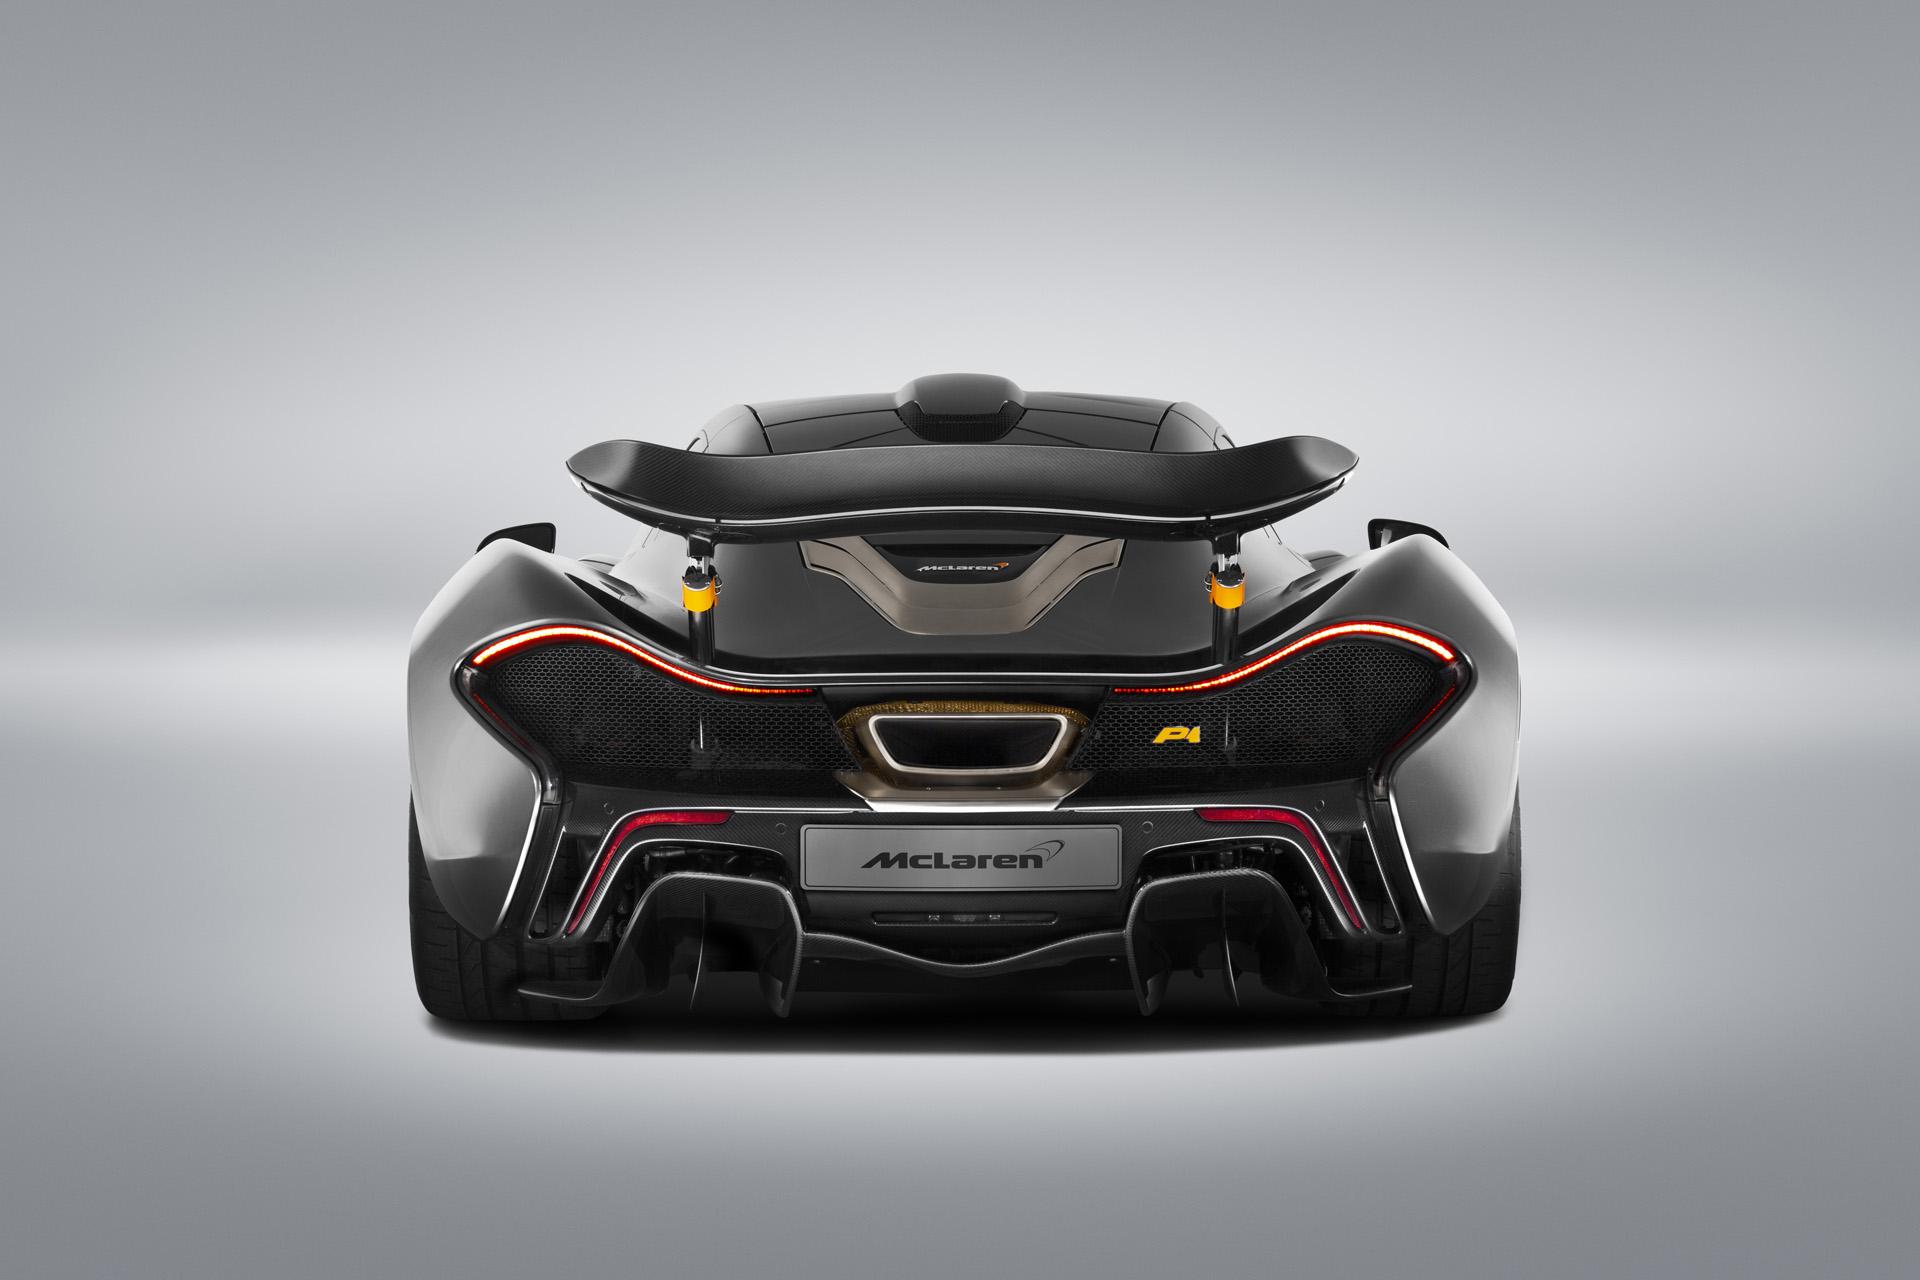 Bespoke McLaren 650S MSO, P1 Debuting at Pebble Beach - autoevolution